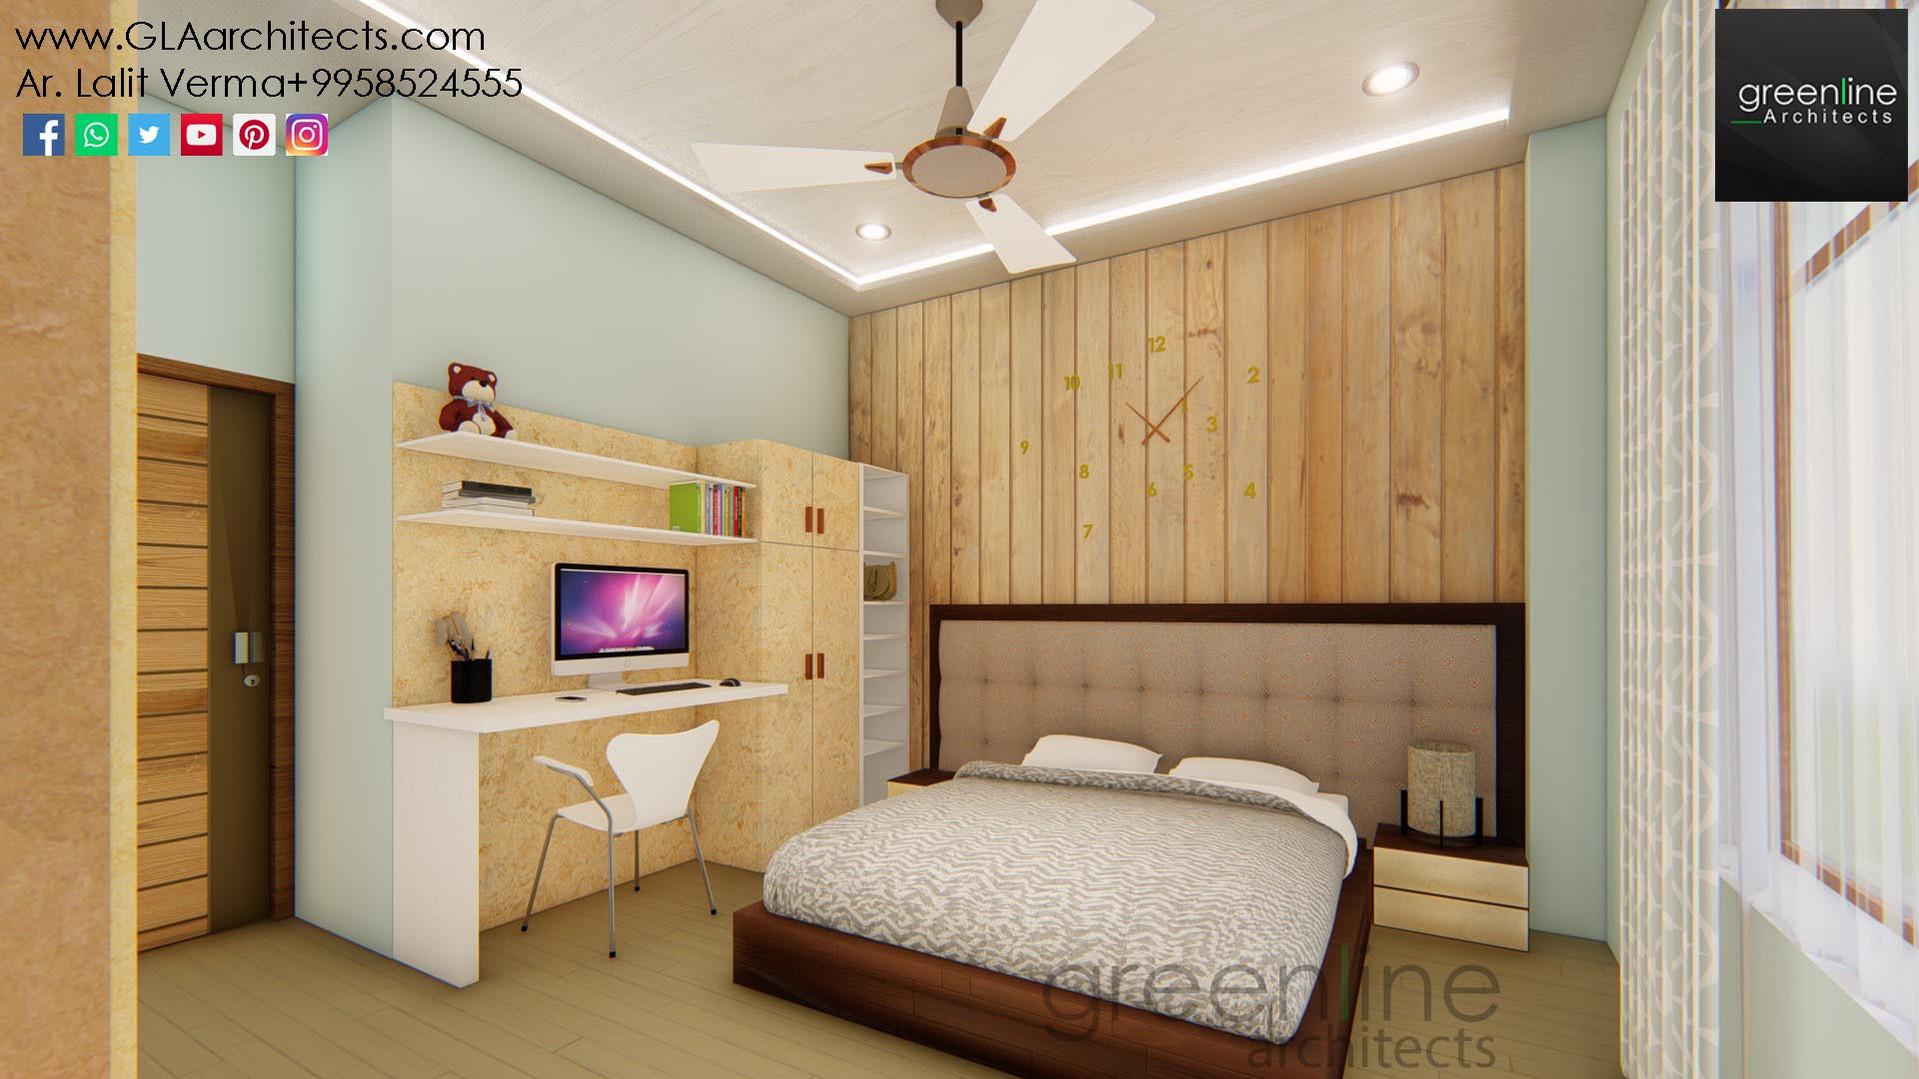 3 BHK-Apartment_Home Interior (15).jpg